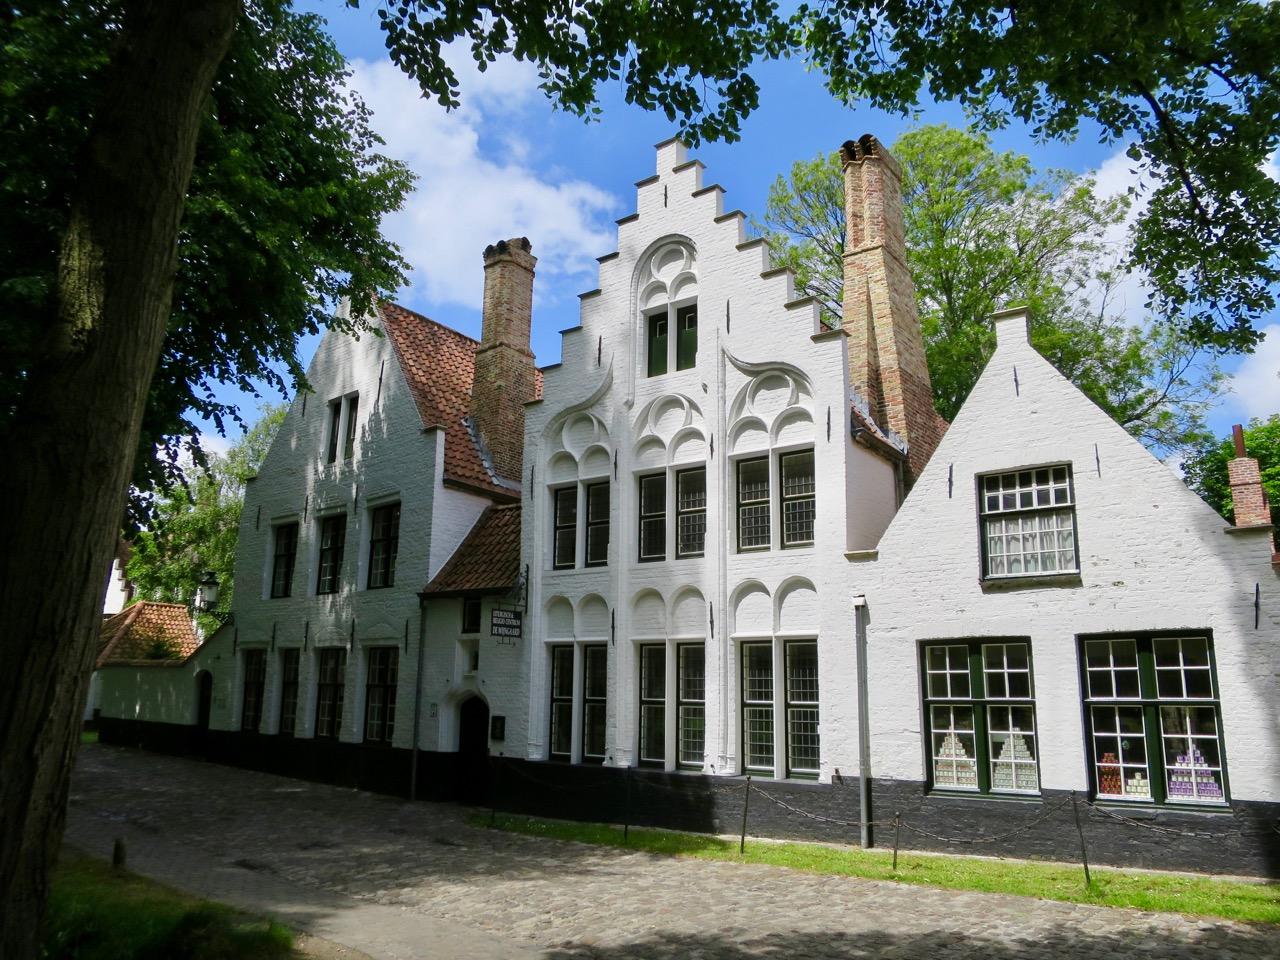 Brugge 1 37